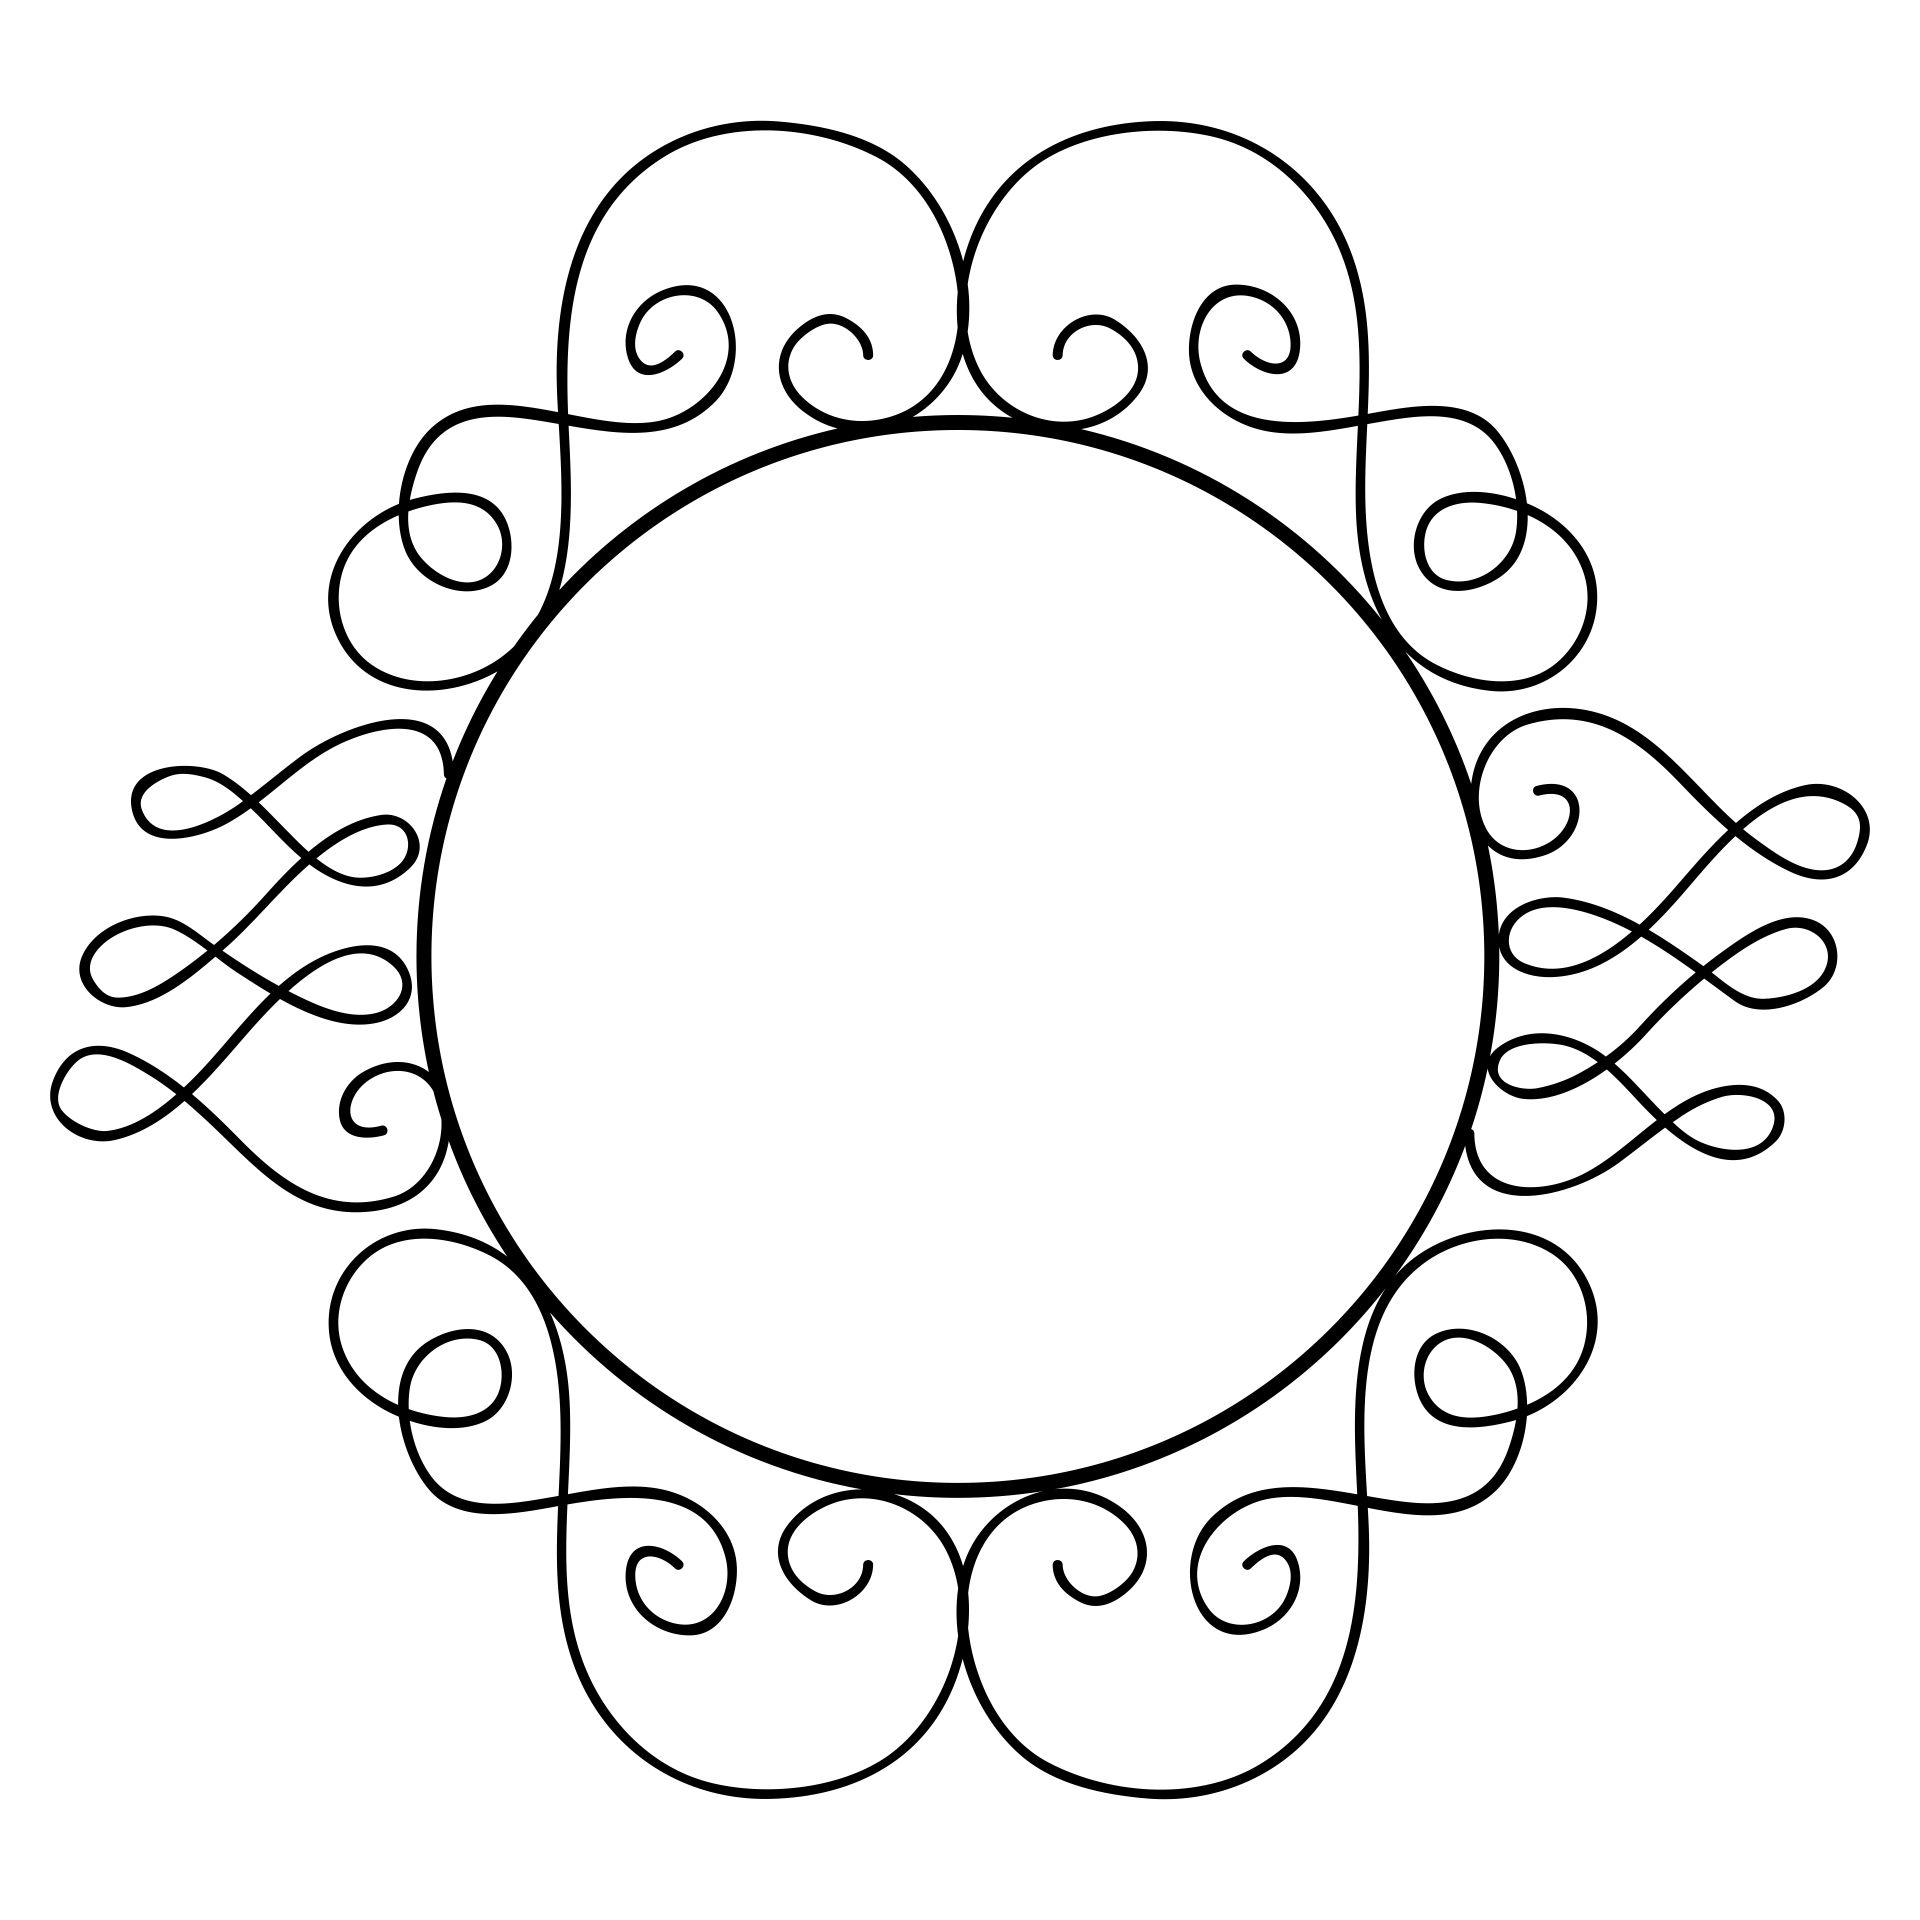 Making Wire Jewelry Patterns